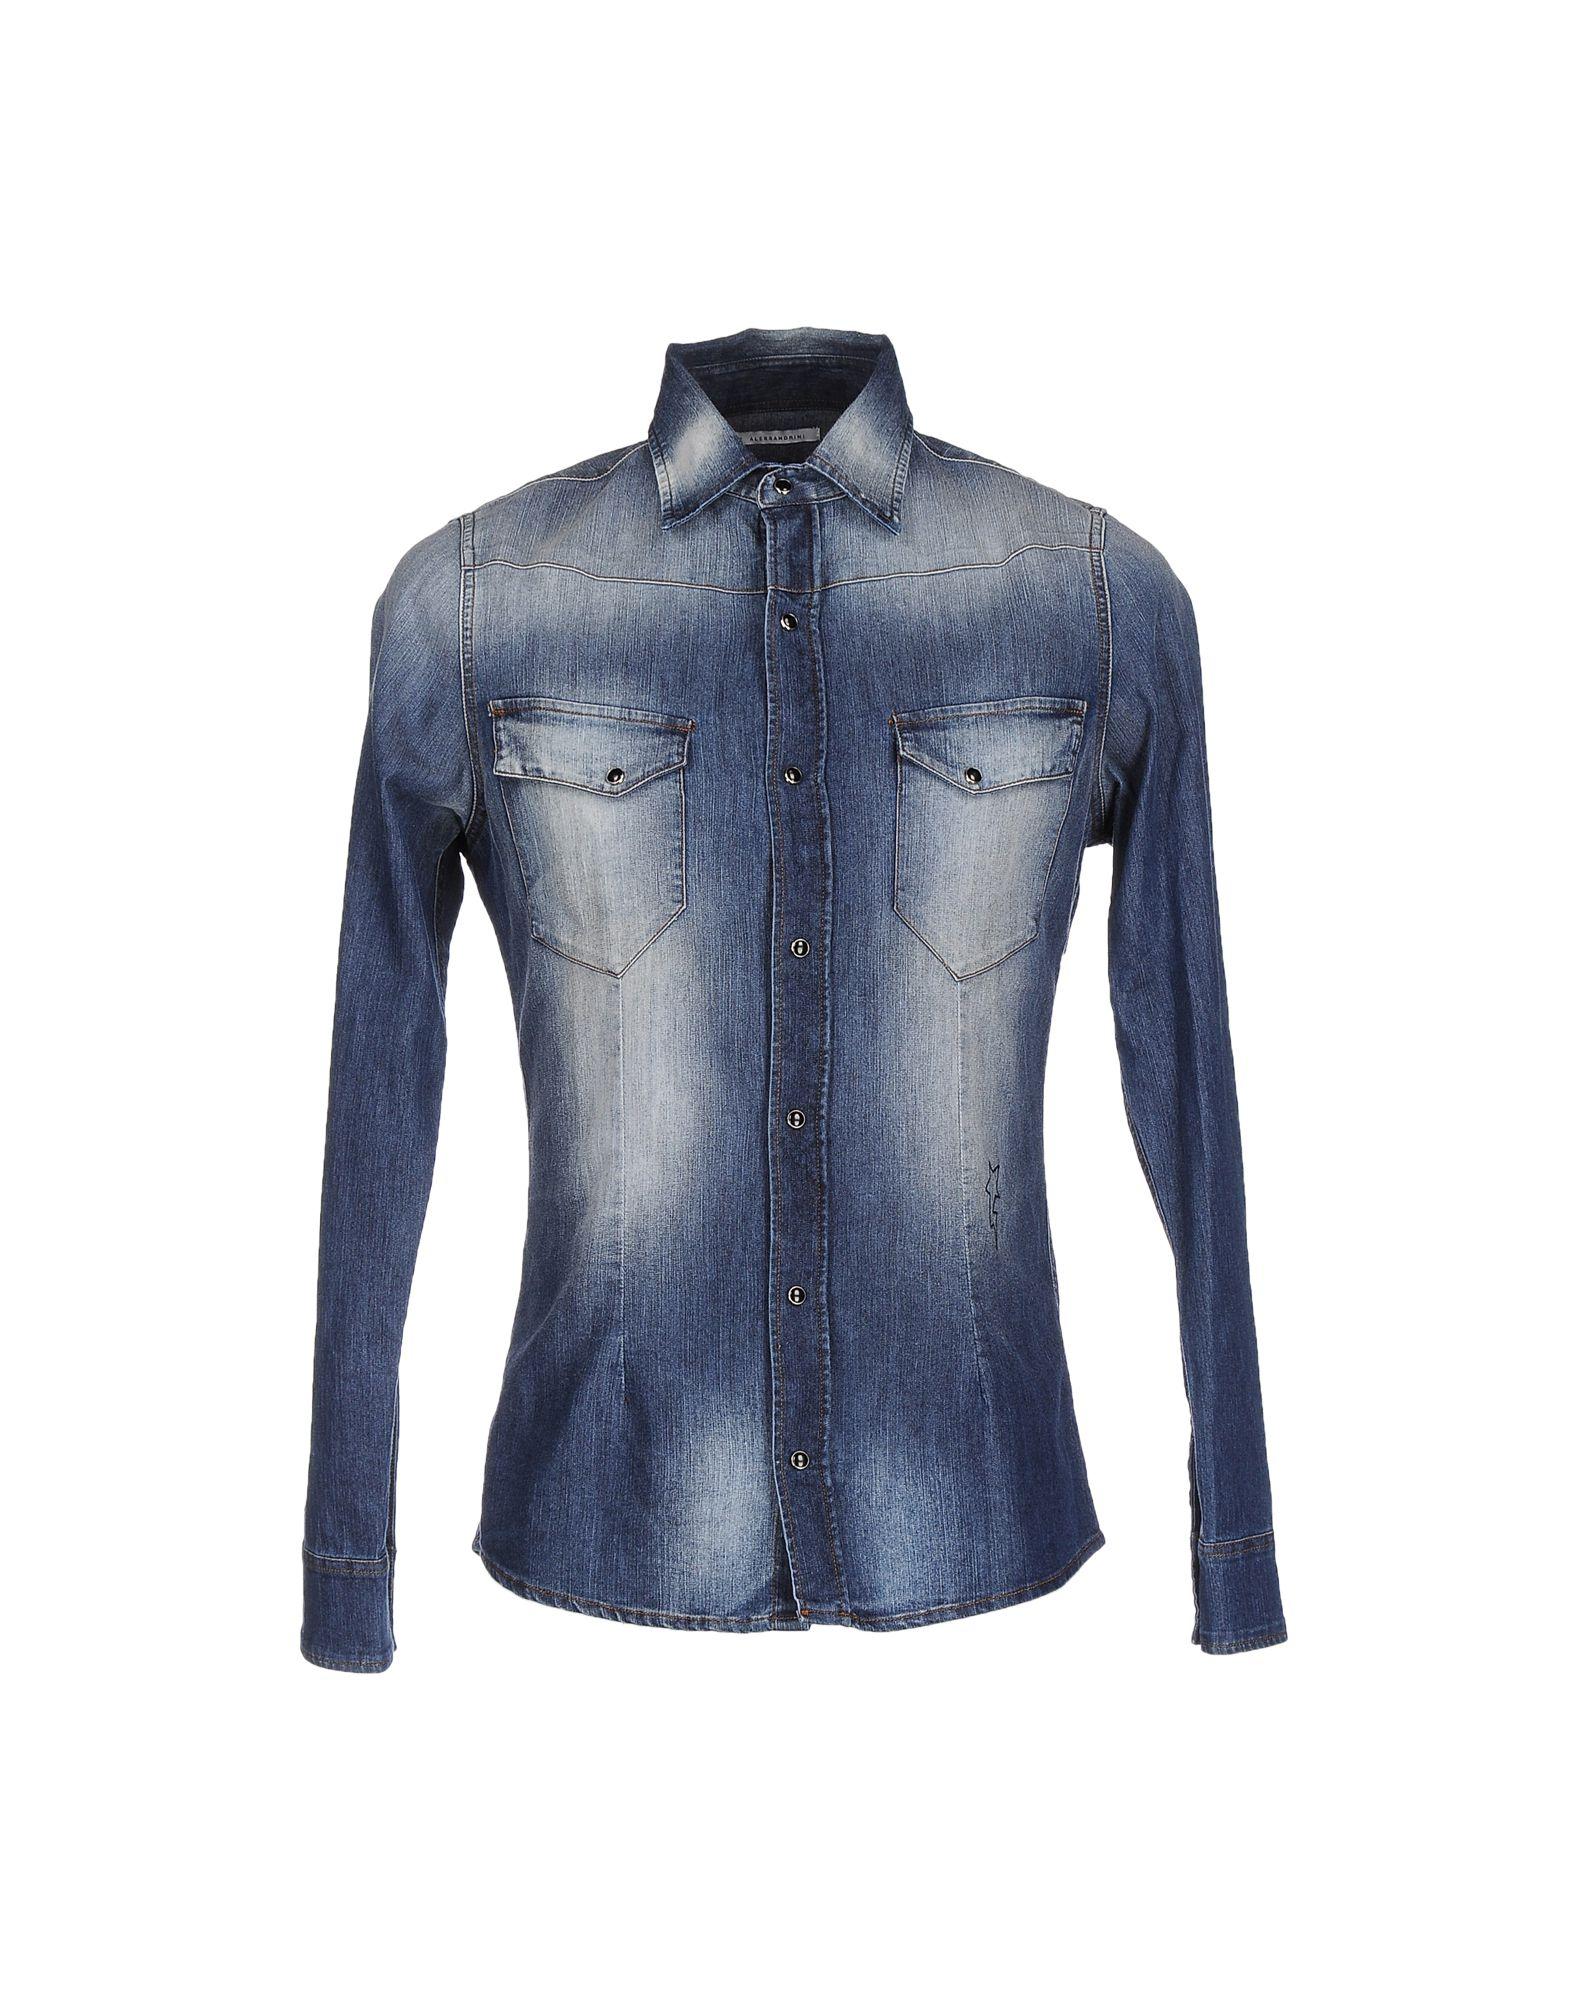 DANIELE ALESSANDRINI Denim shirts